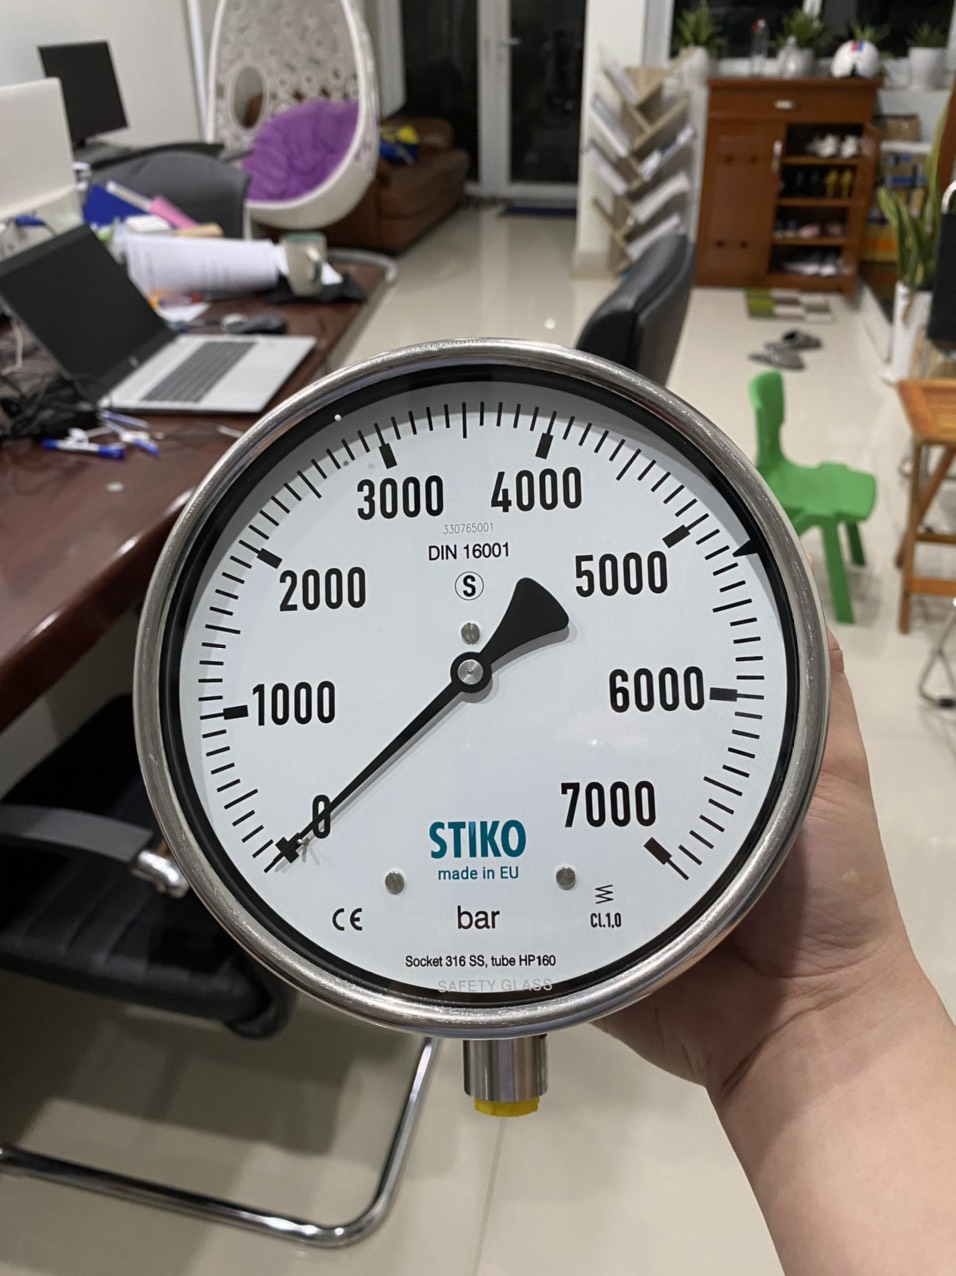 đồng hồ áp suất 7000 bar